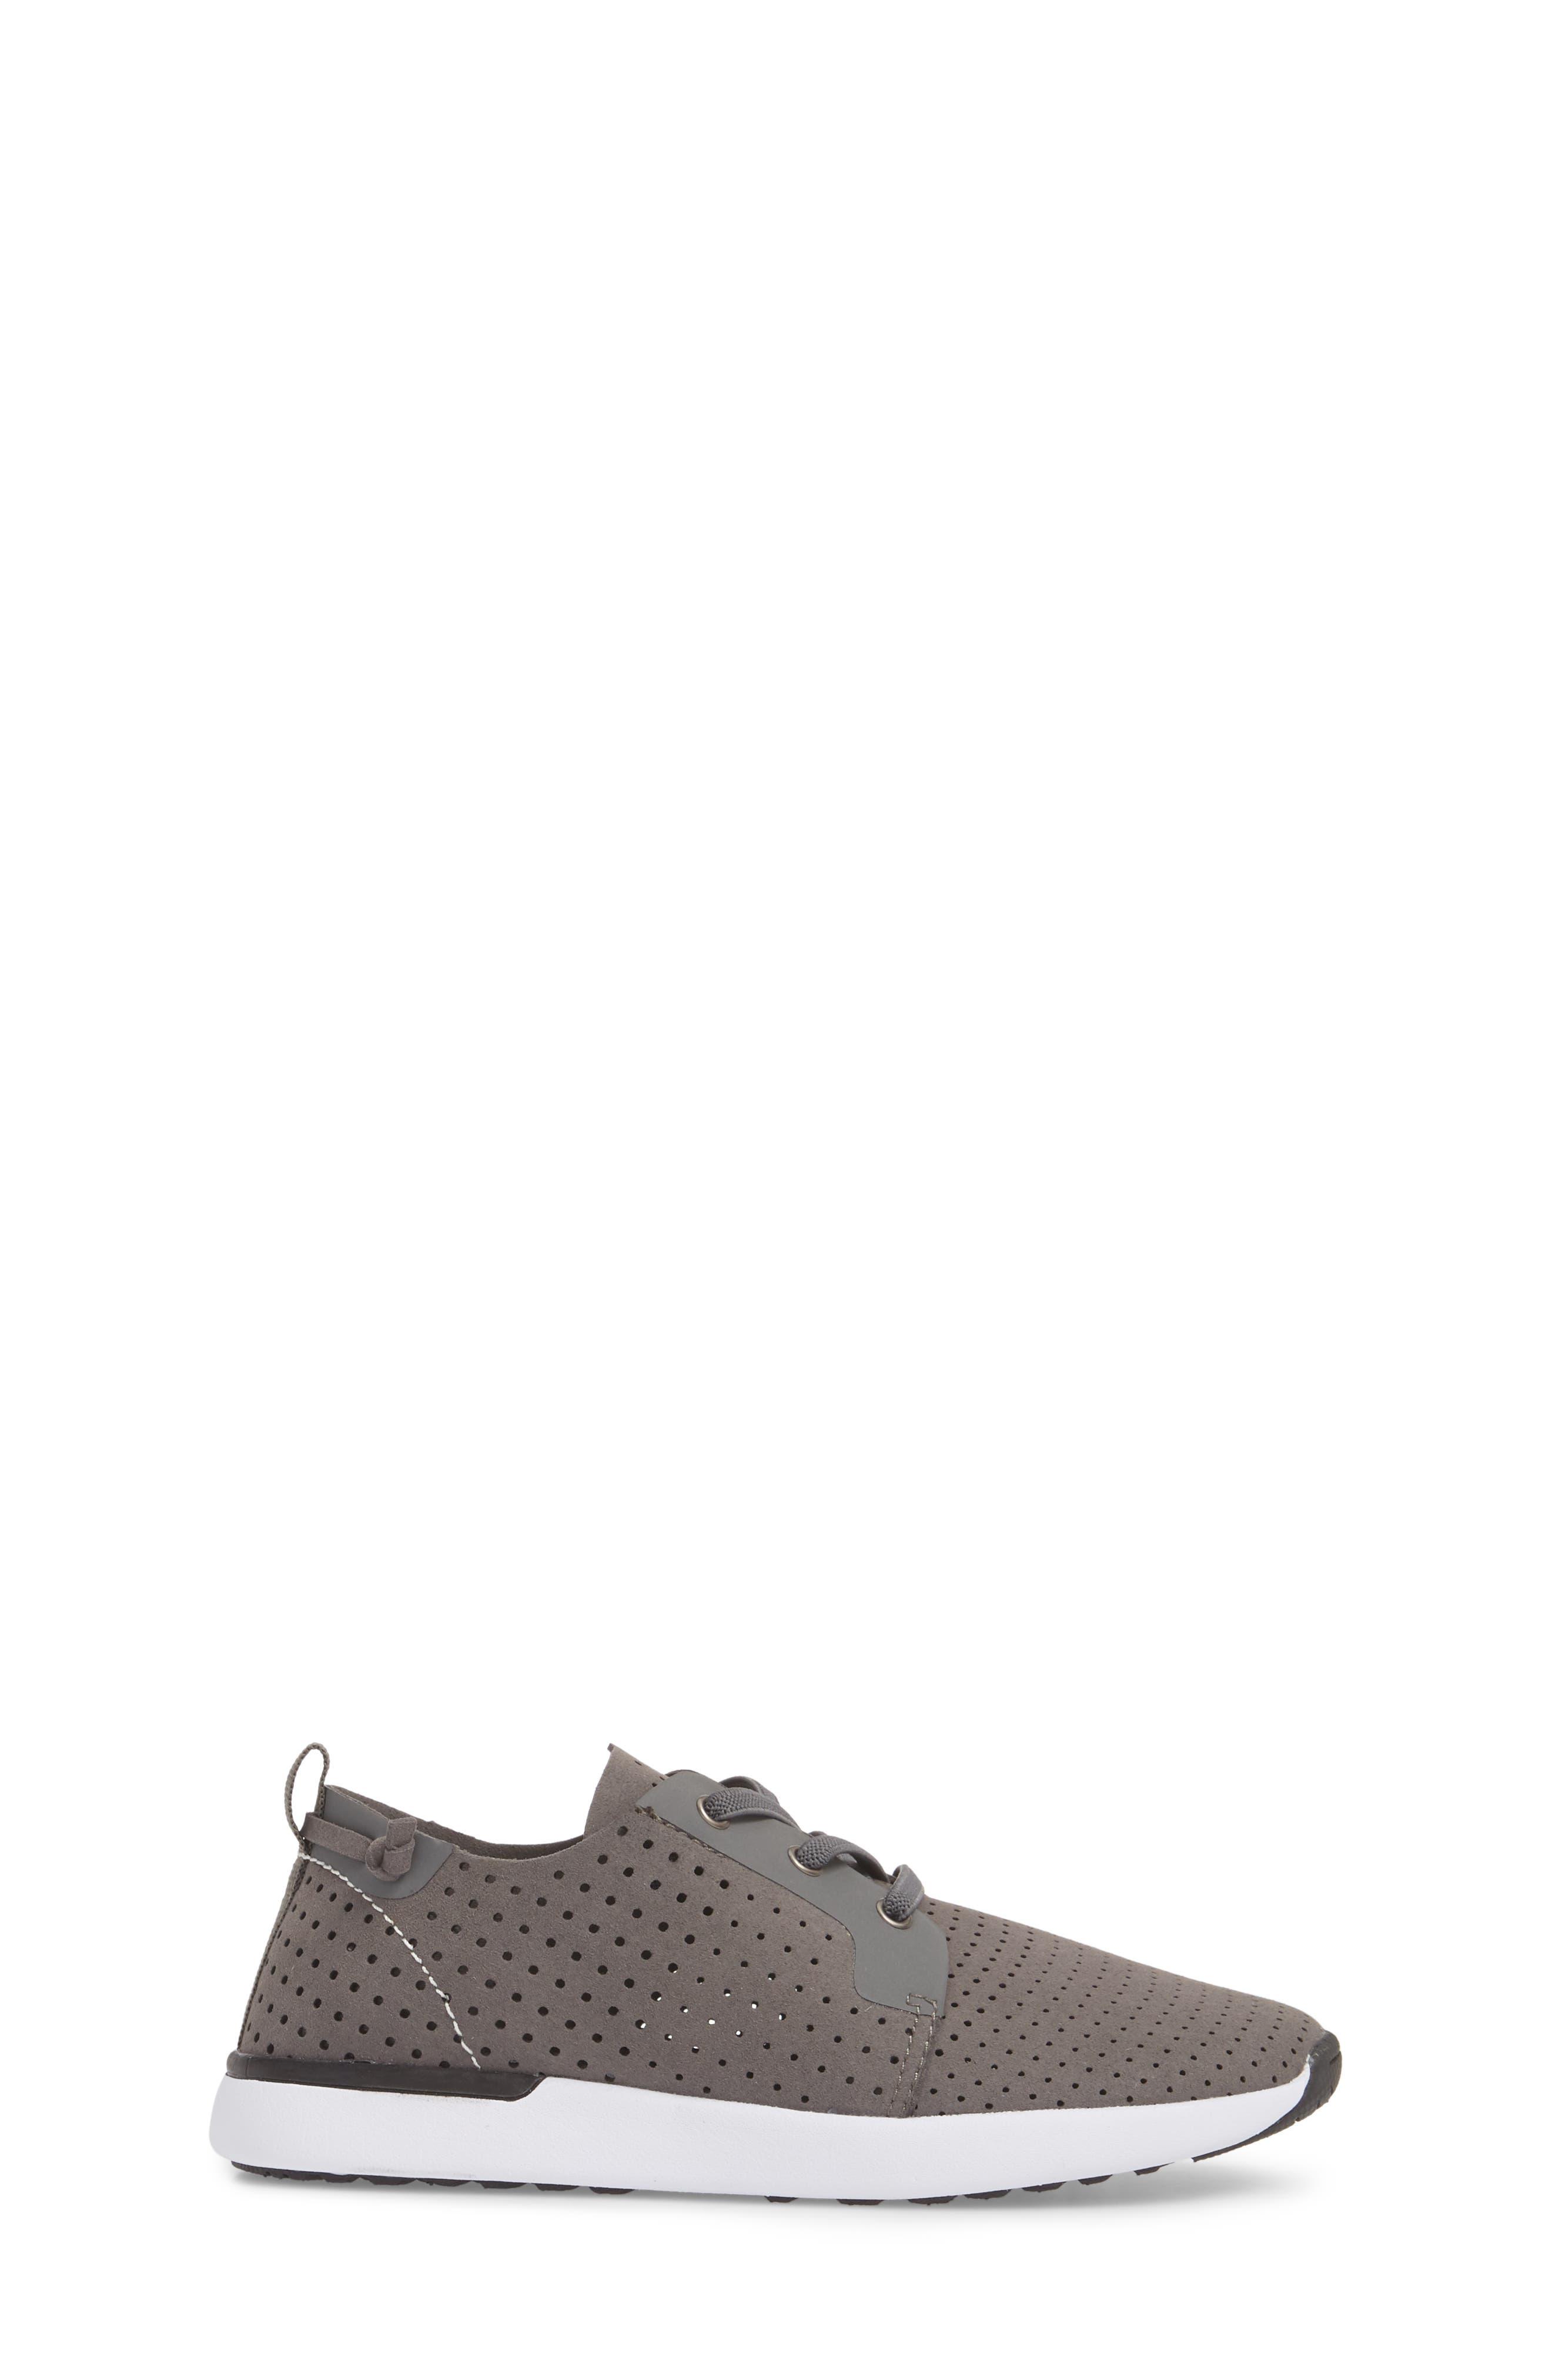 Brixxon Perforated Sneaker,                             Alternate thumbnail 3, color,                             Grey